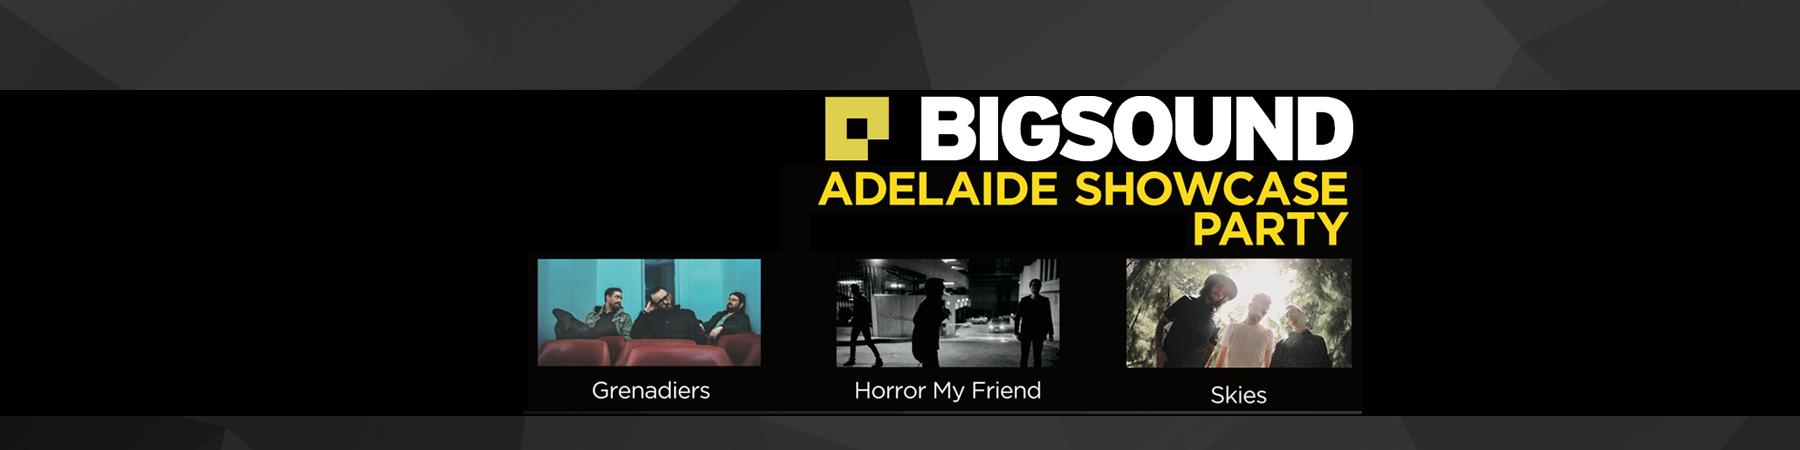 Bigsound-AdelaideBands-2015-slider2